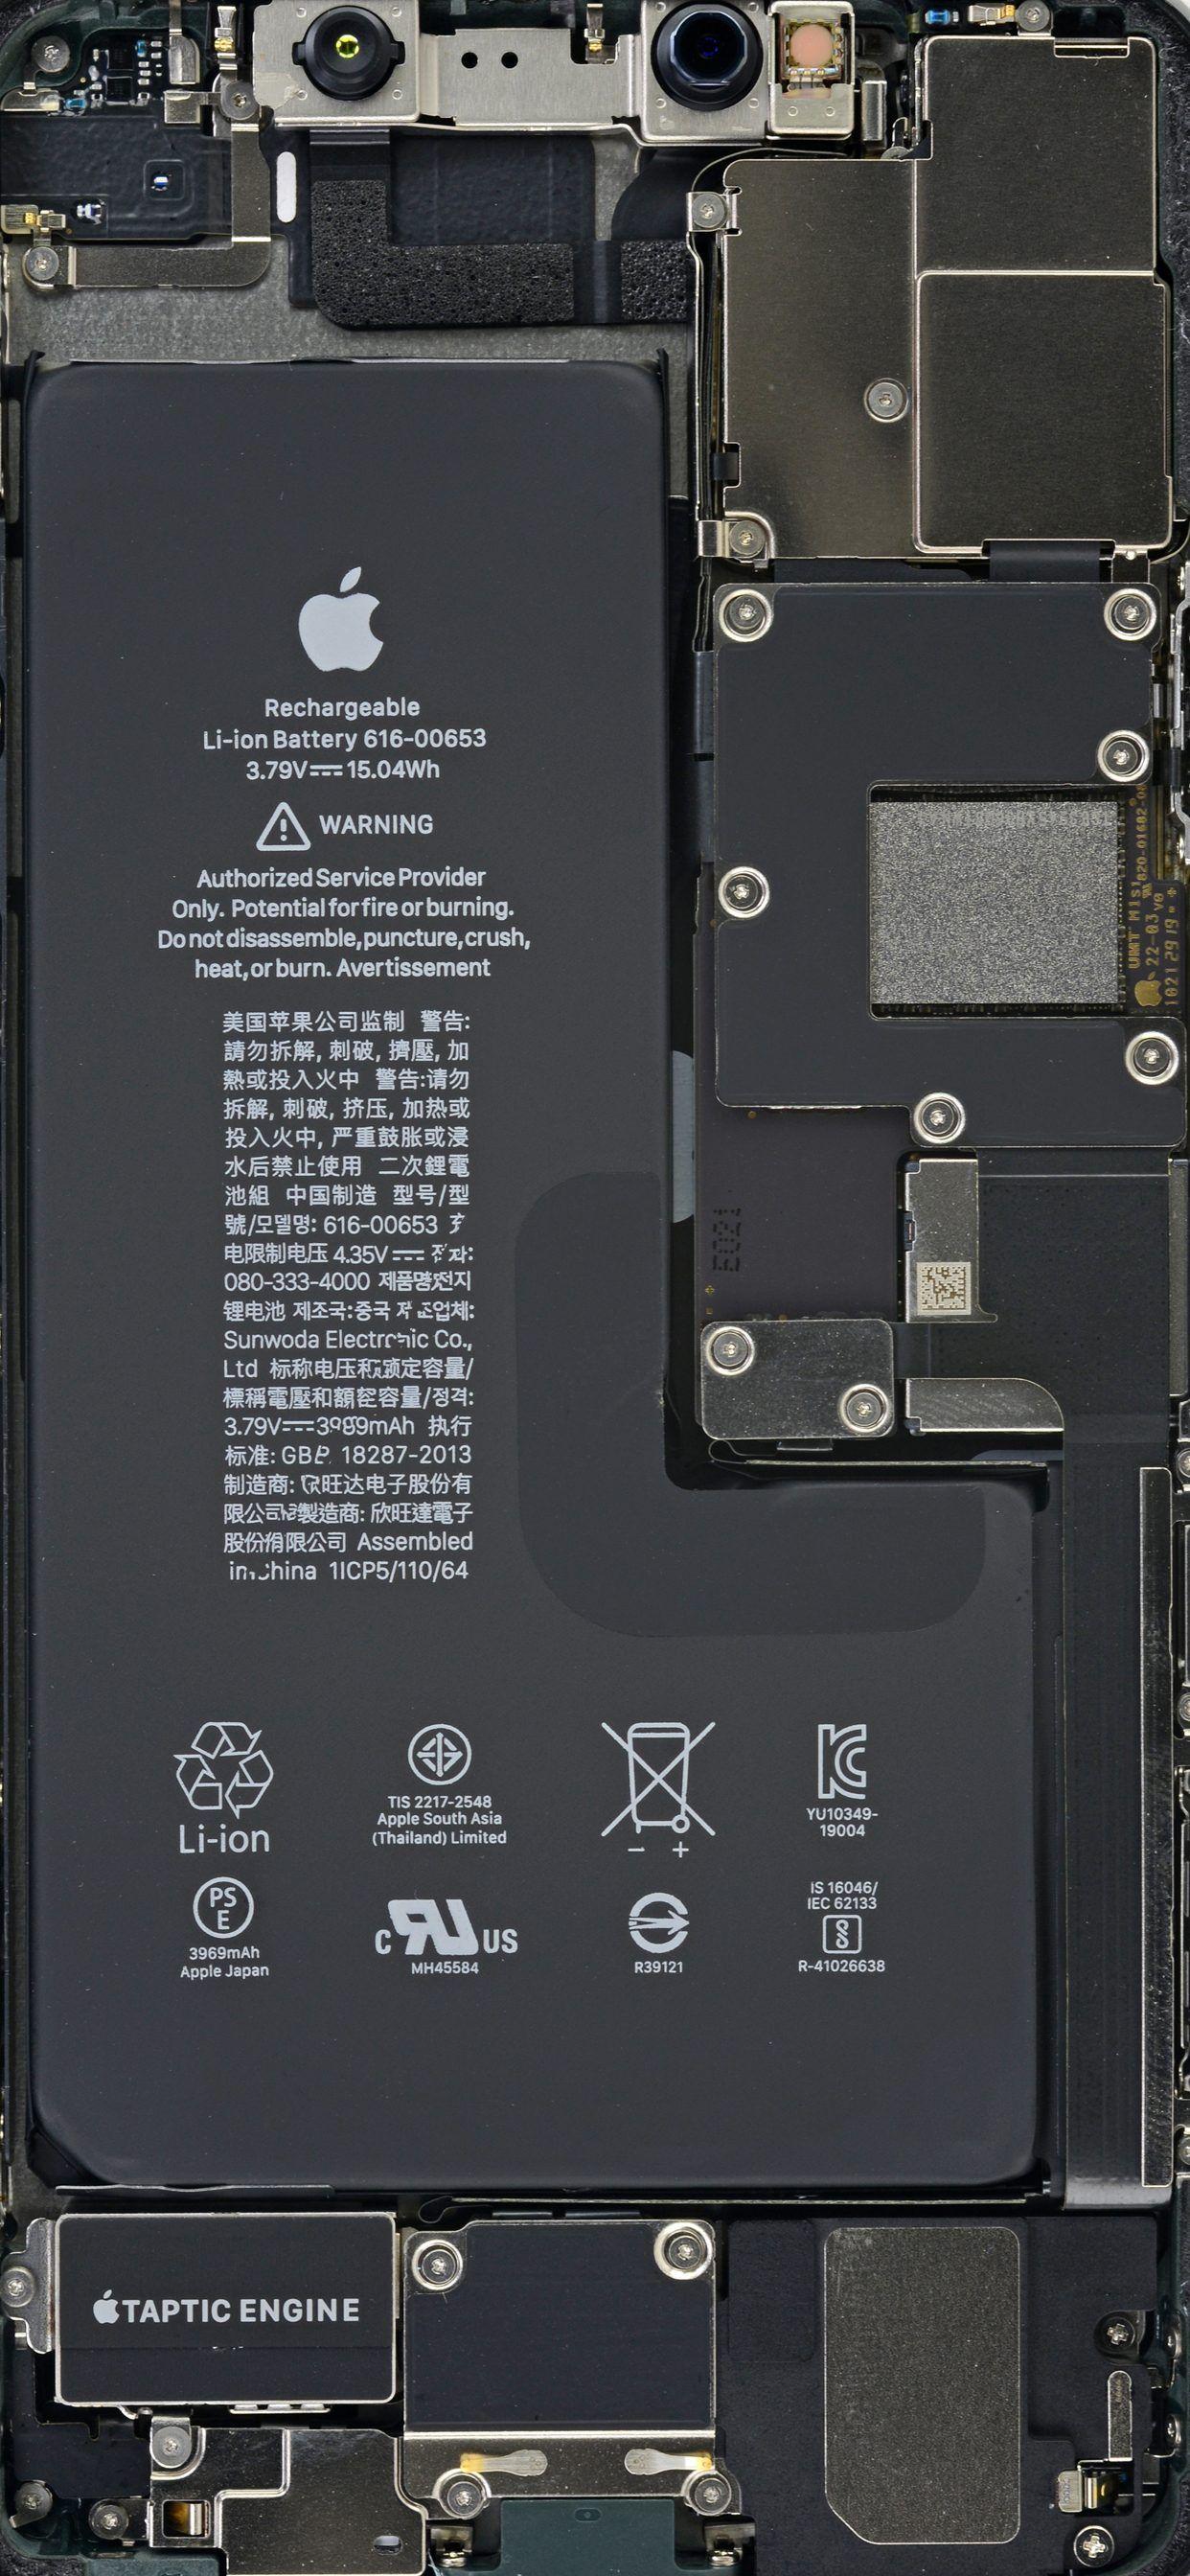 Iphone 11 Pro Max Clear Wallpaper Di 2020 Wallpaper Iphone Iphone Ponsel